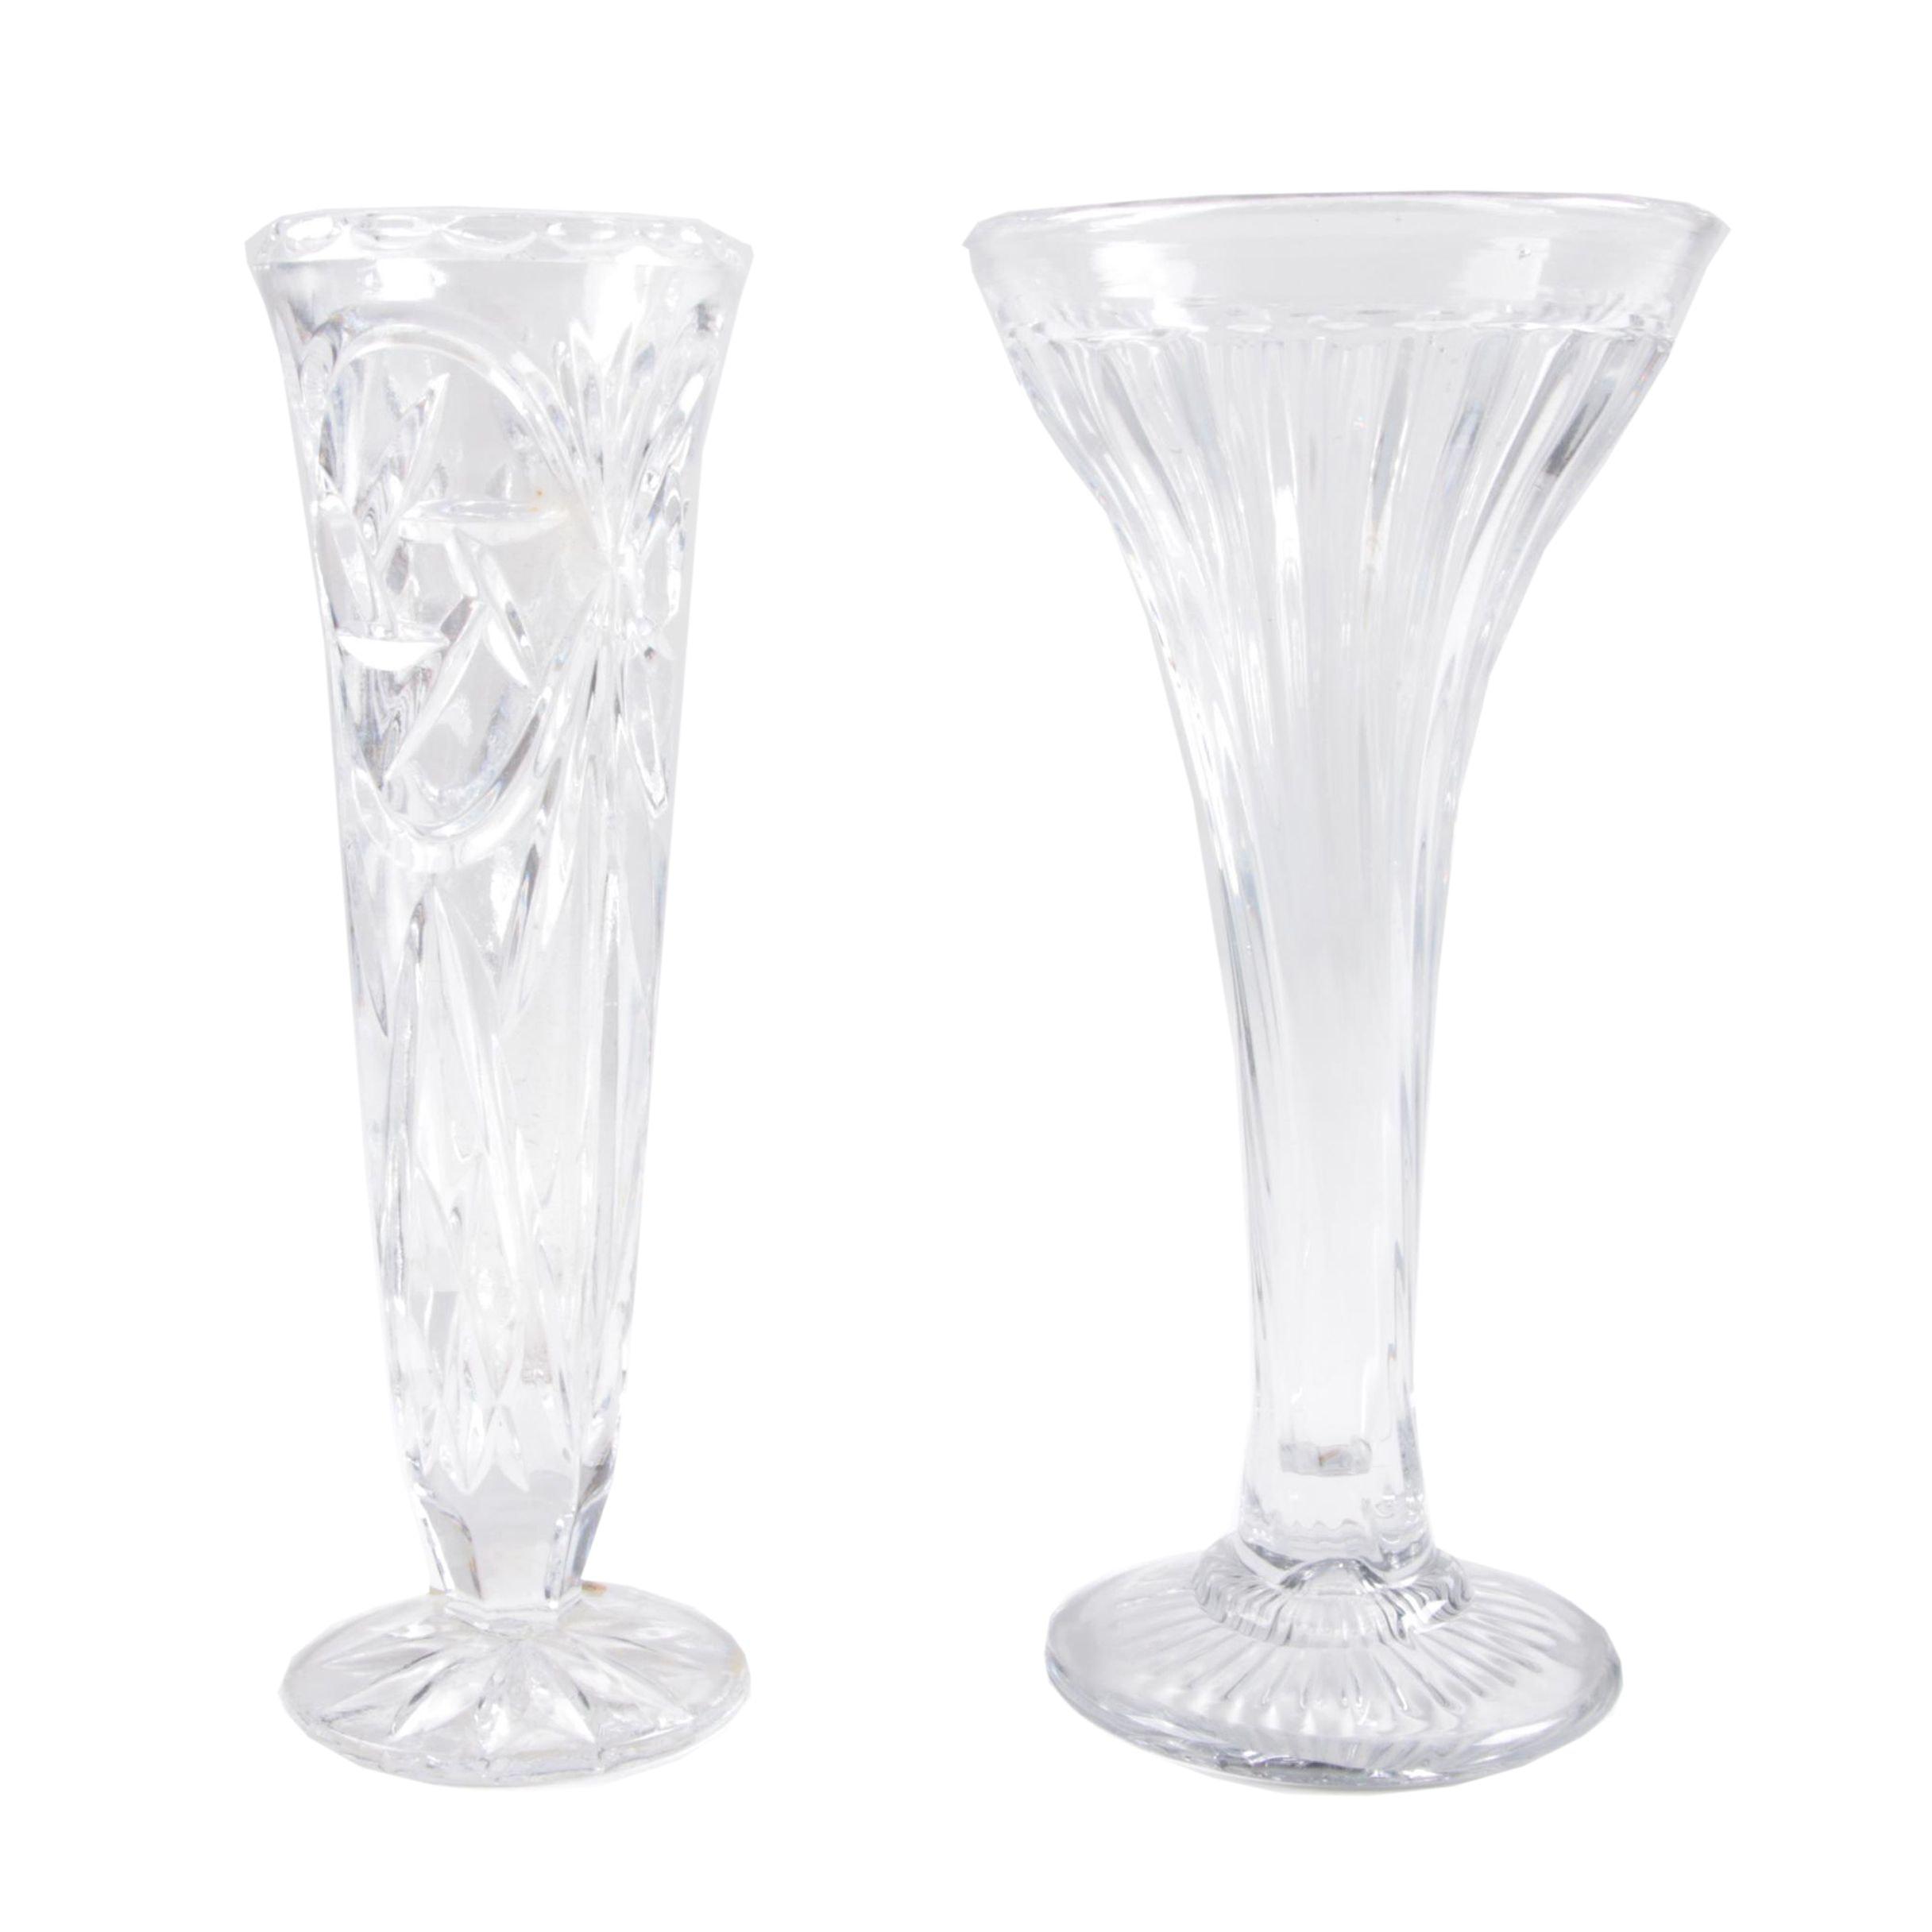 Crystal Vases Featuring Bleikristall